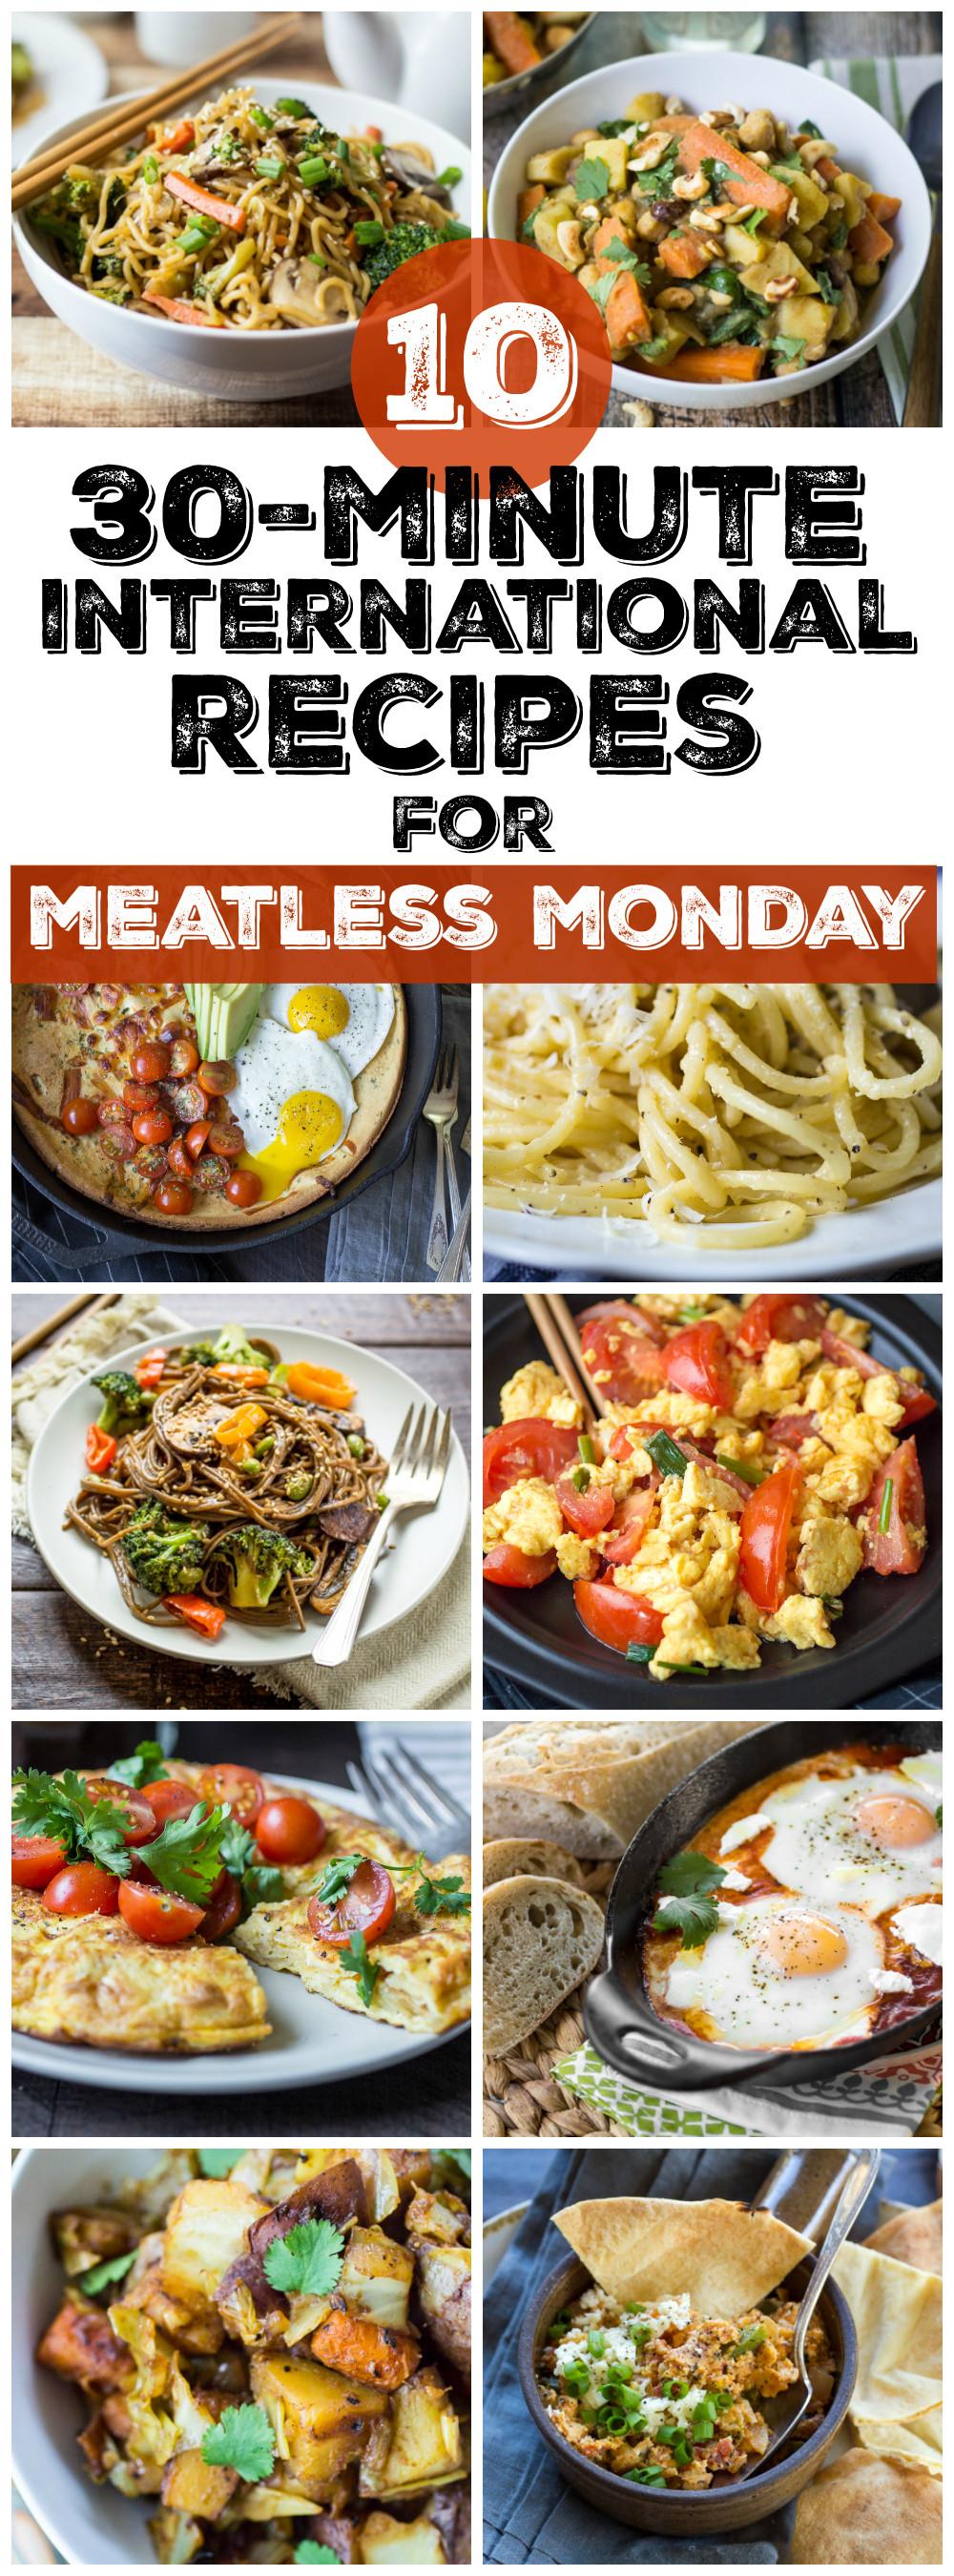 Easy Vegetarian Dinner Recipes  10 Easy Ve arian Dinner Recipes from Around the World